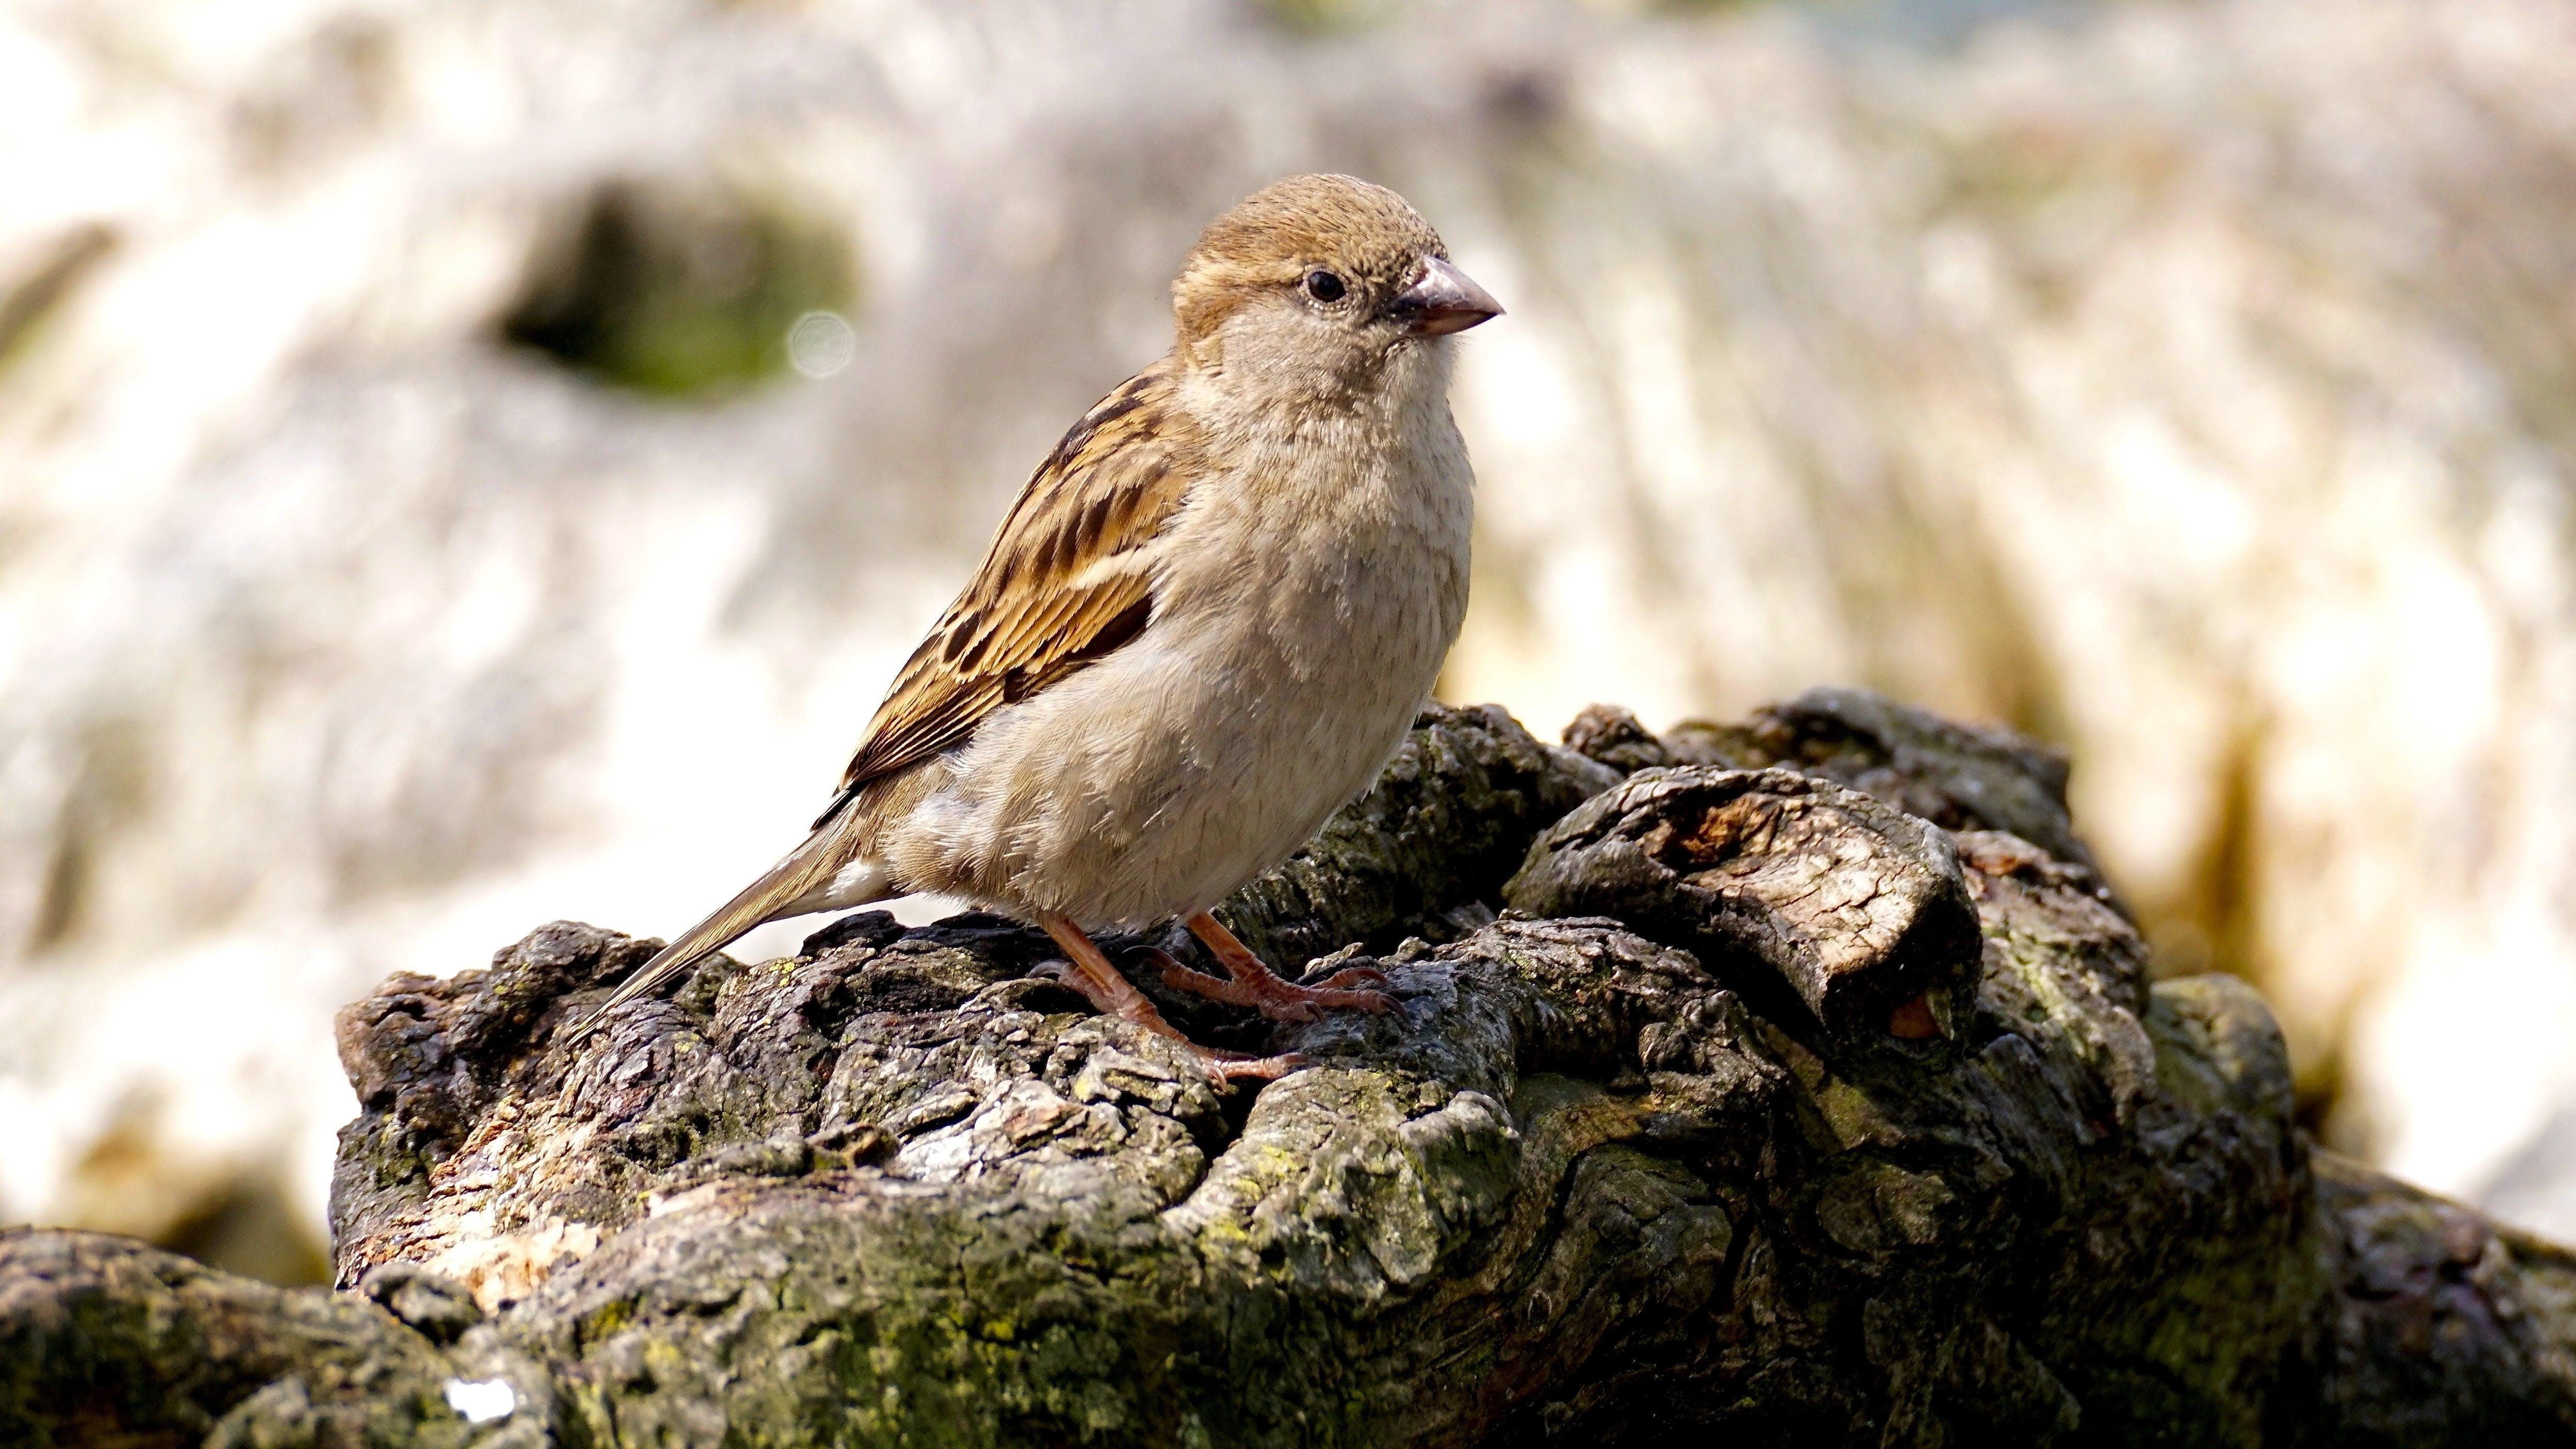 Selective Focus Photo of Brown Bird